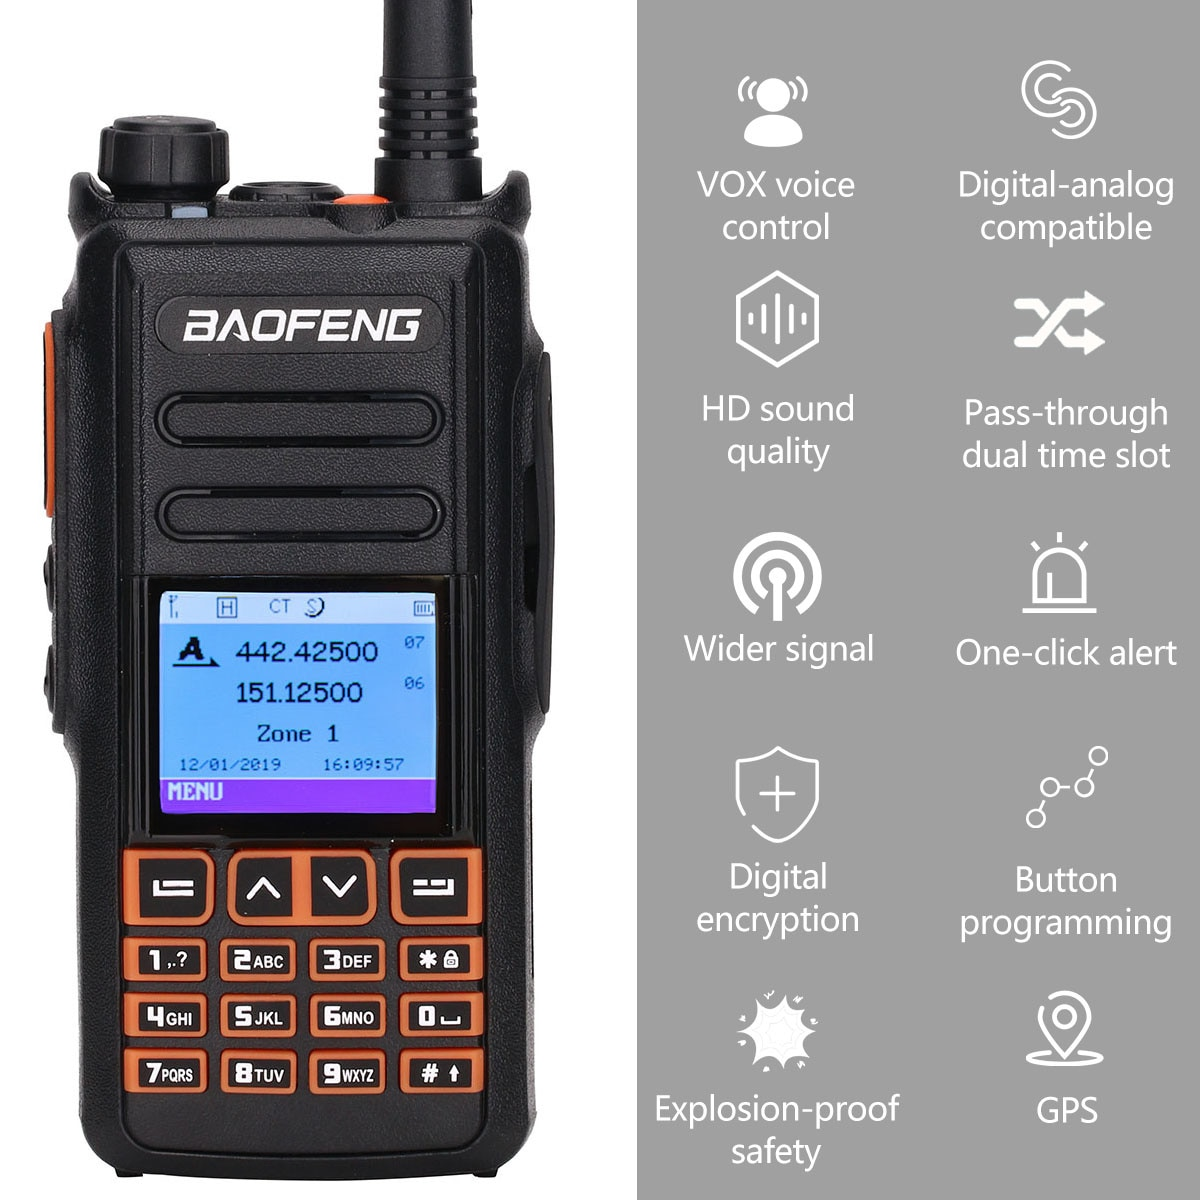 BaoFeng DM-X DMR digital walkie talkie GPS vhf uhf dual band 136-174 & 400 - 470MHz Dual Time Slot Ham Two Way Radi enlarge